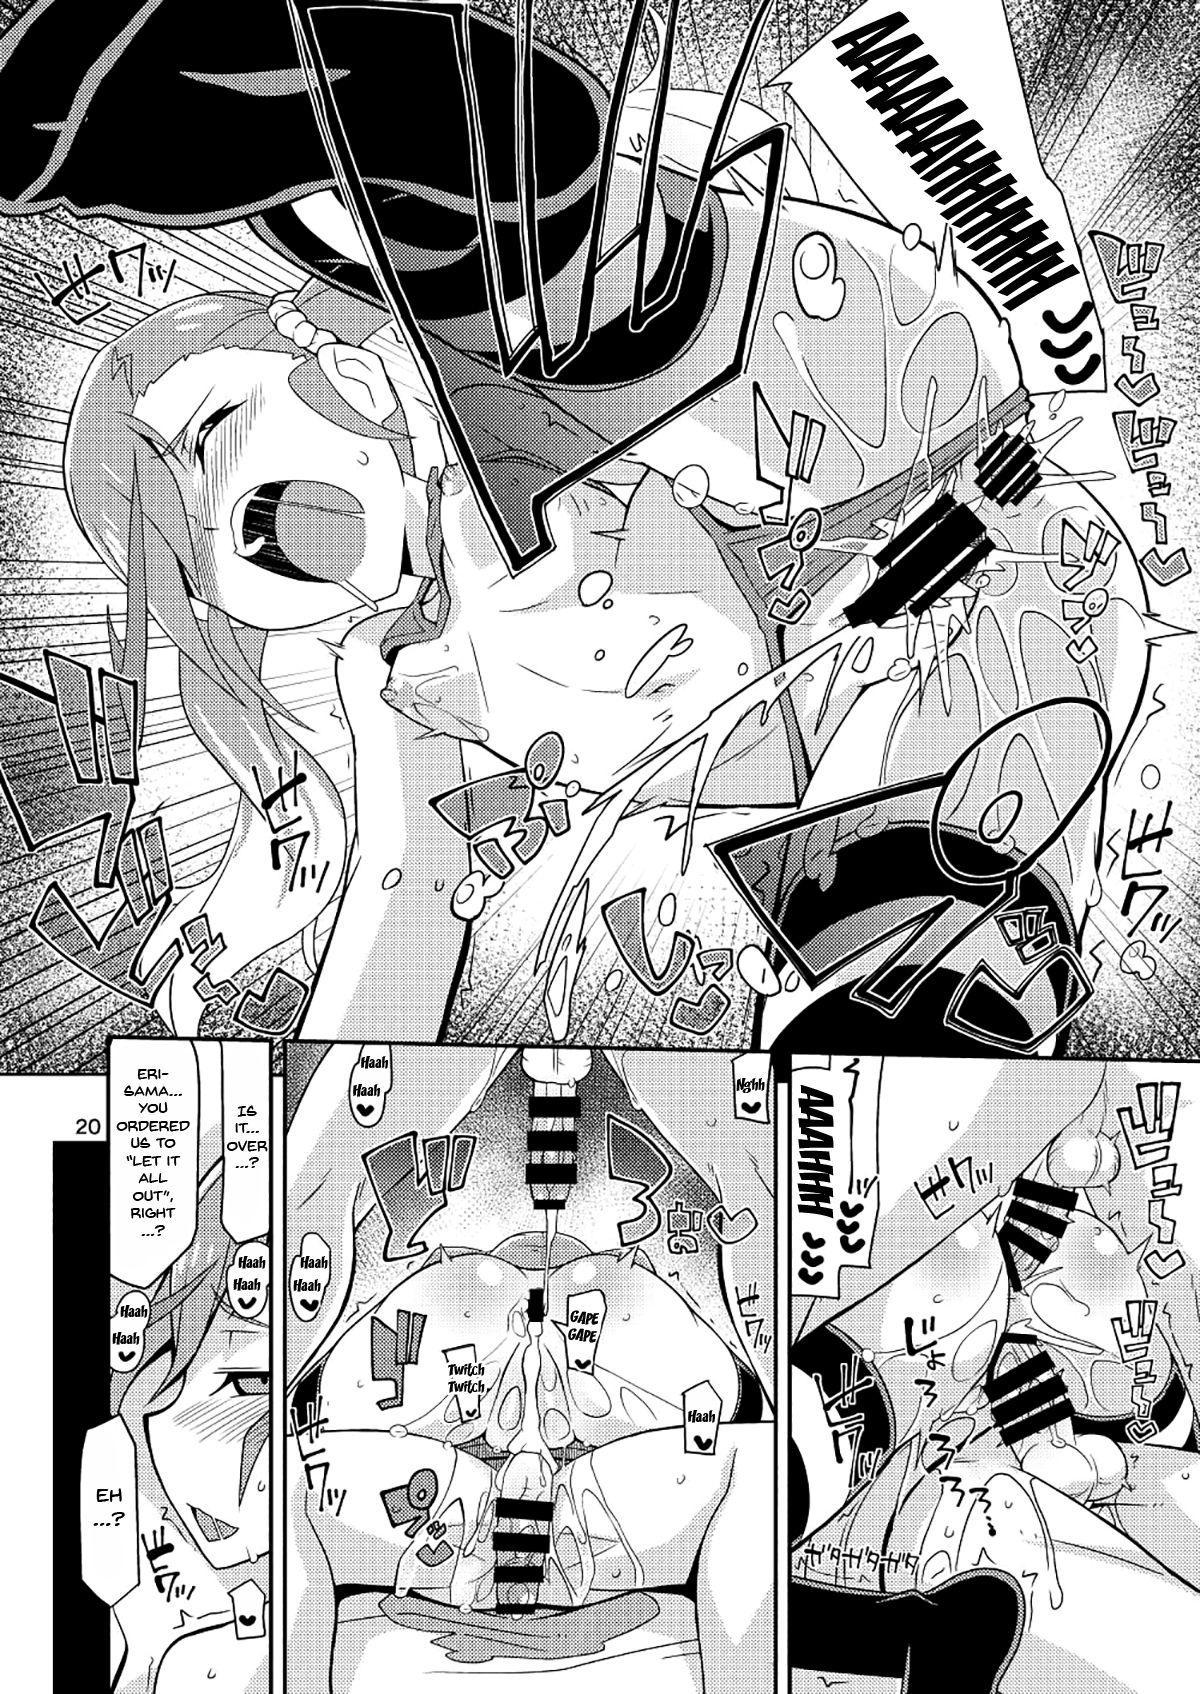 [4or5 Works (Chicago)] Eri-sama Dokkan Eigyouchuu | Eri-sama's Open For Business (Digimon Universe: Appli Monsters) [English] {Doujins.com} [Digital] 18